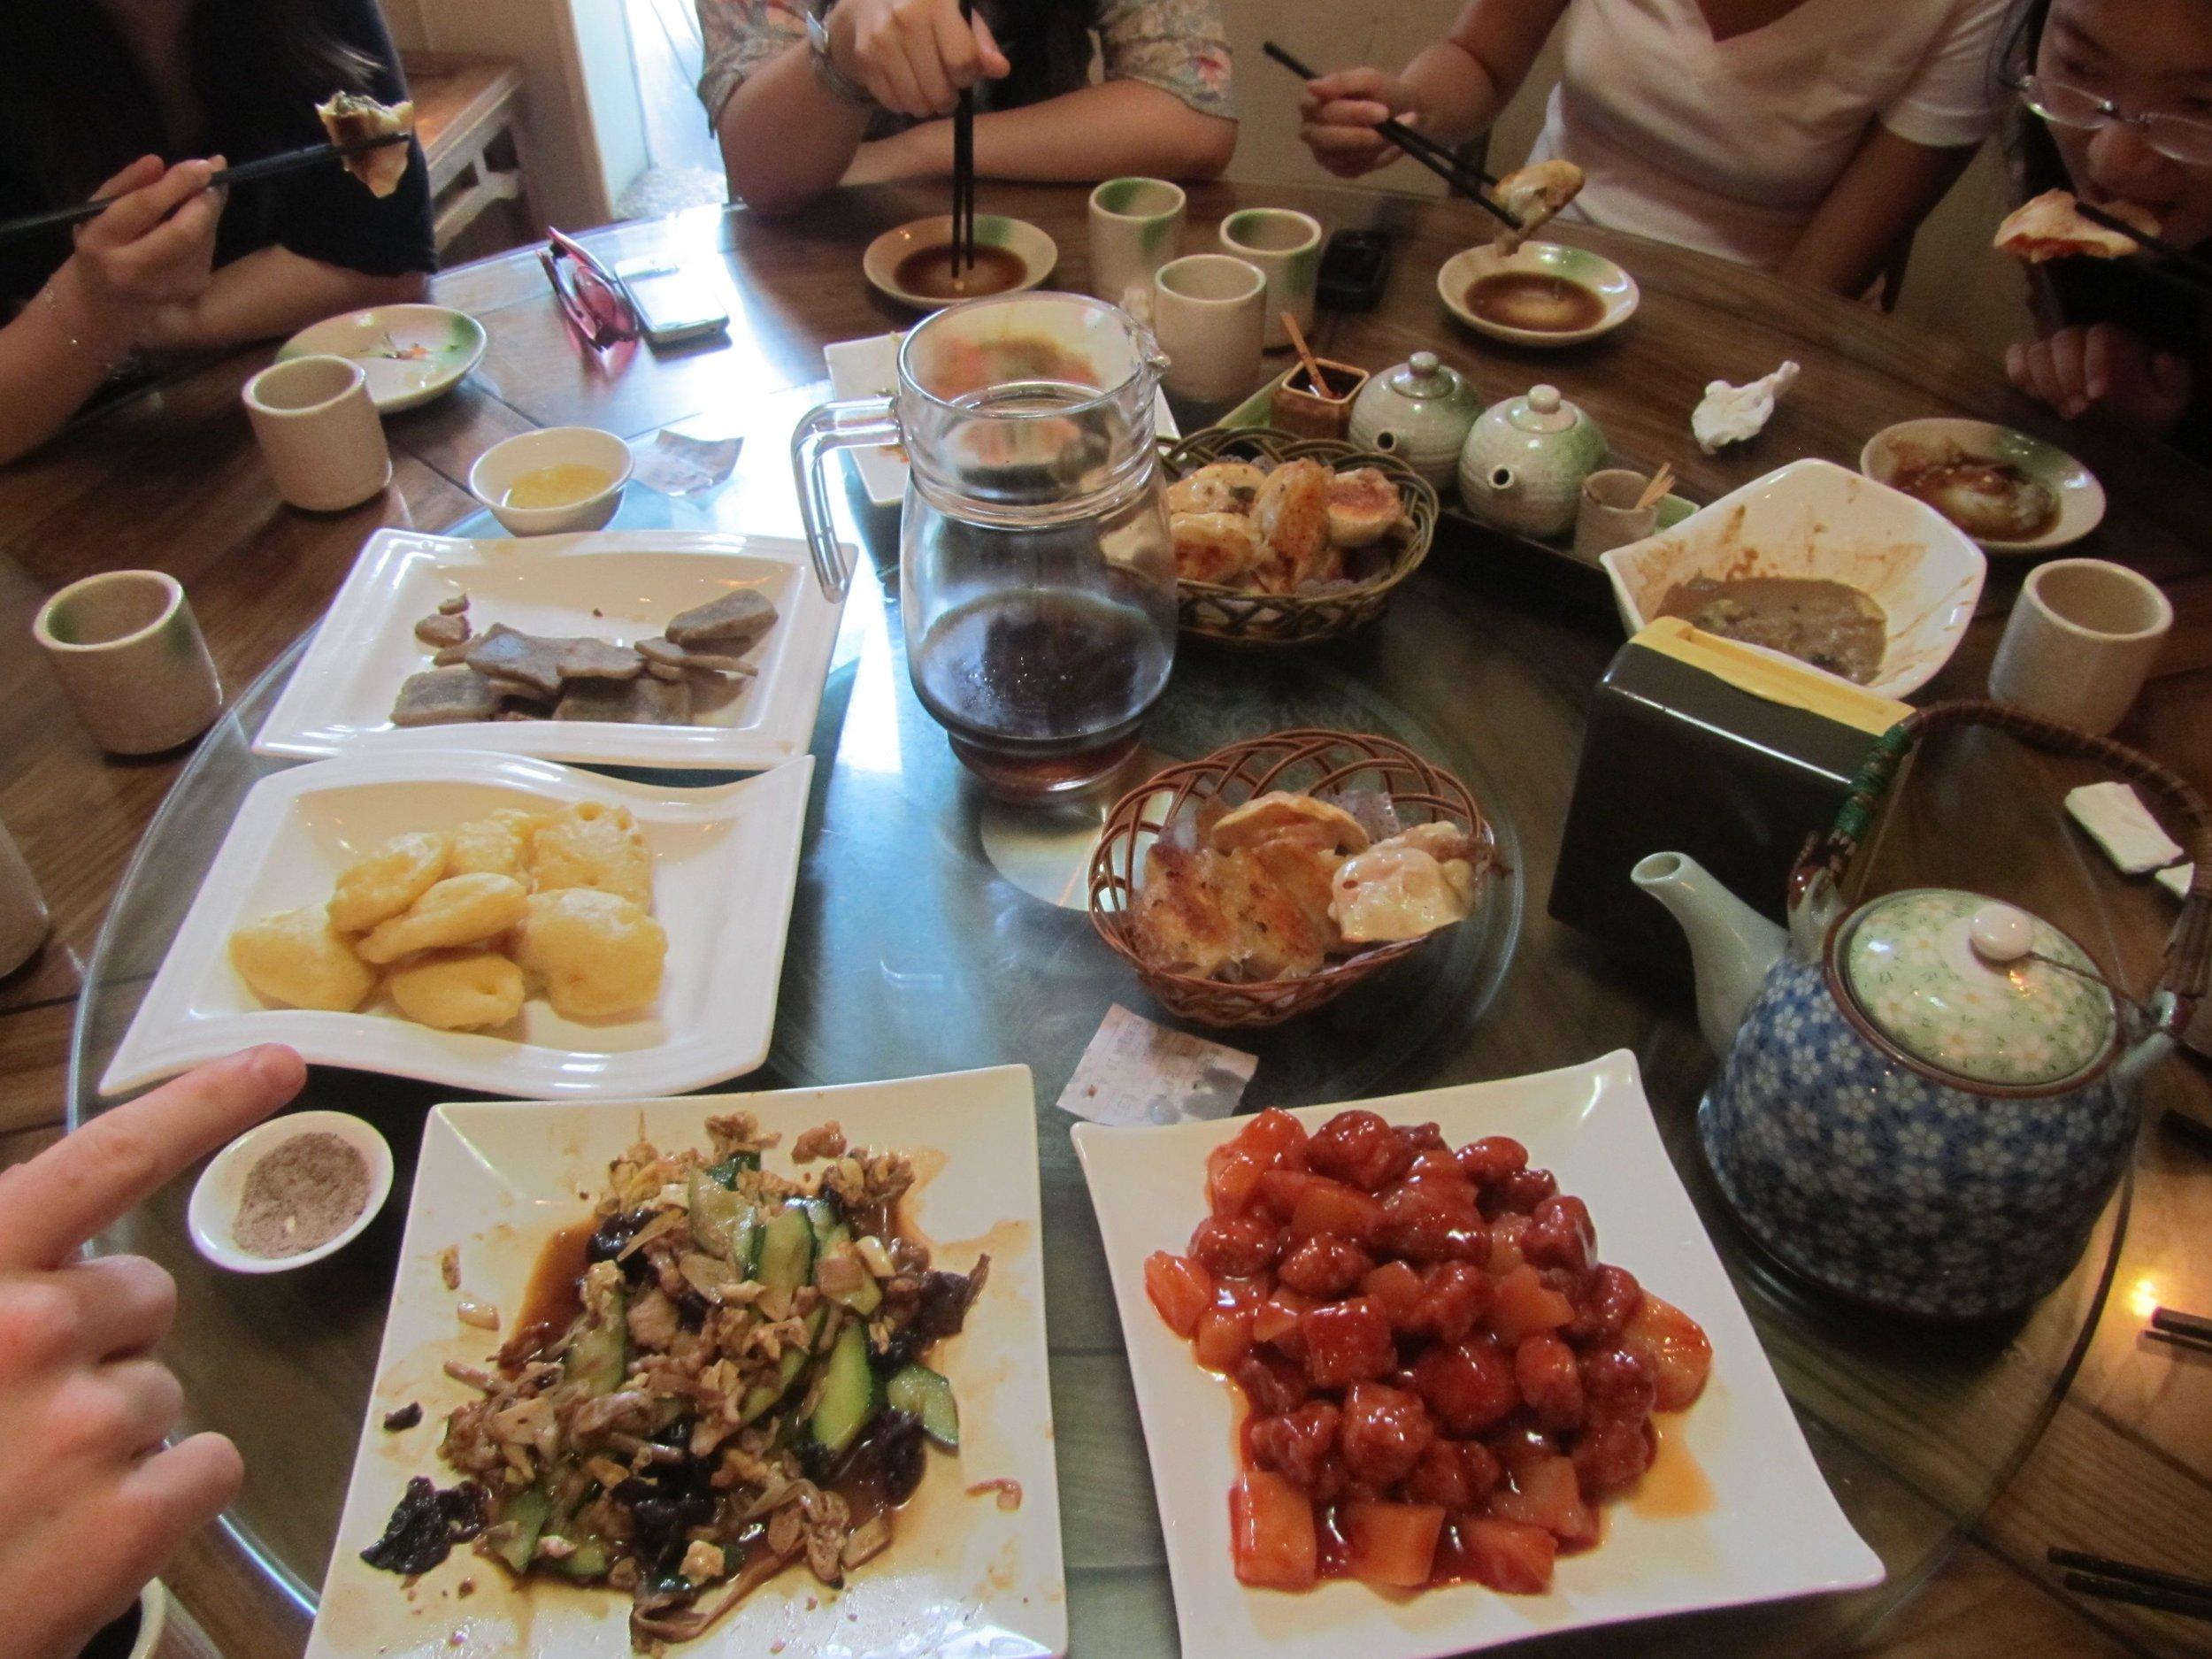 The spread at Xianlaoman Dumpling house